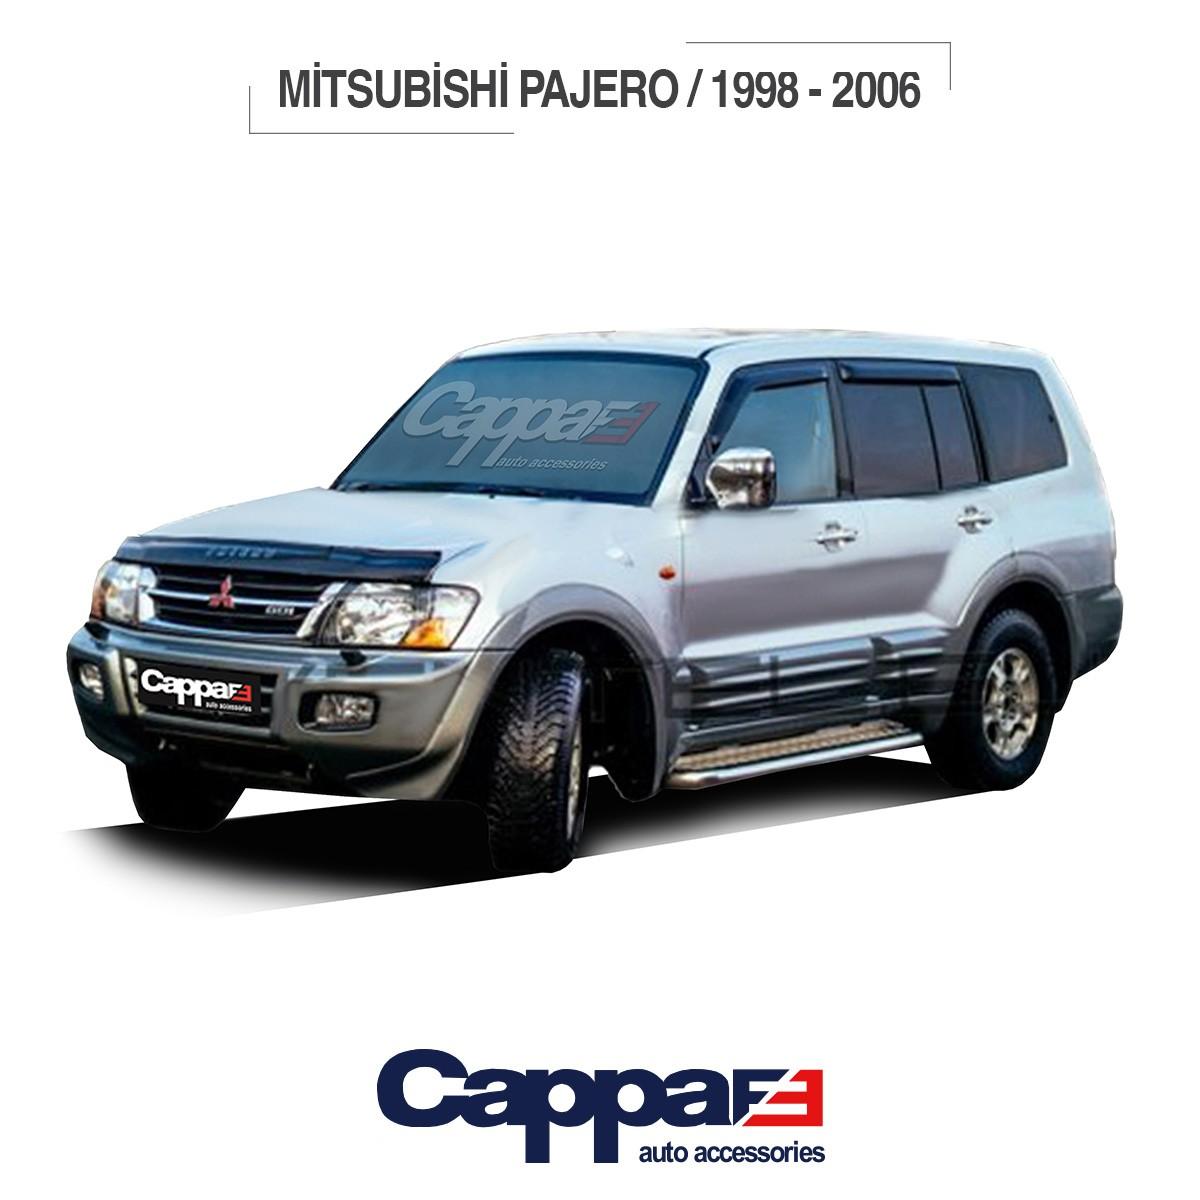 MITSUBISHI PAJERO / 1998 - 2006 / KAPUT RÜZGARLIĞI